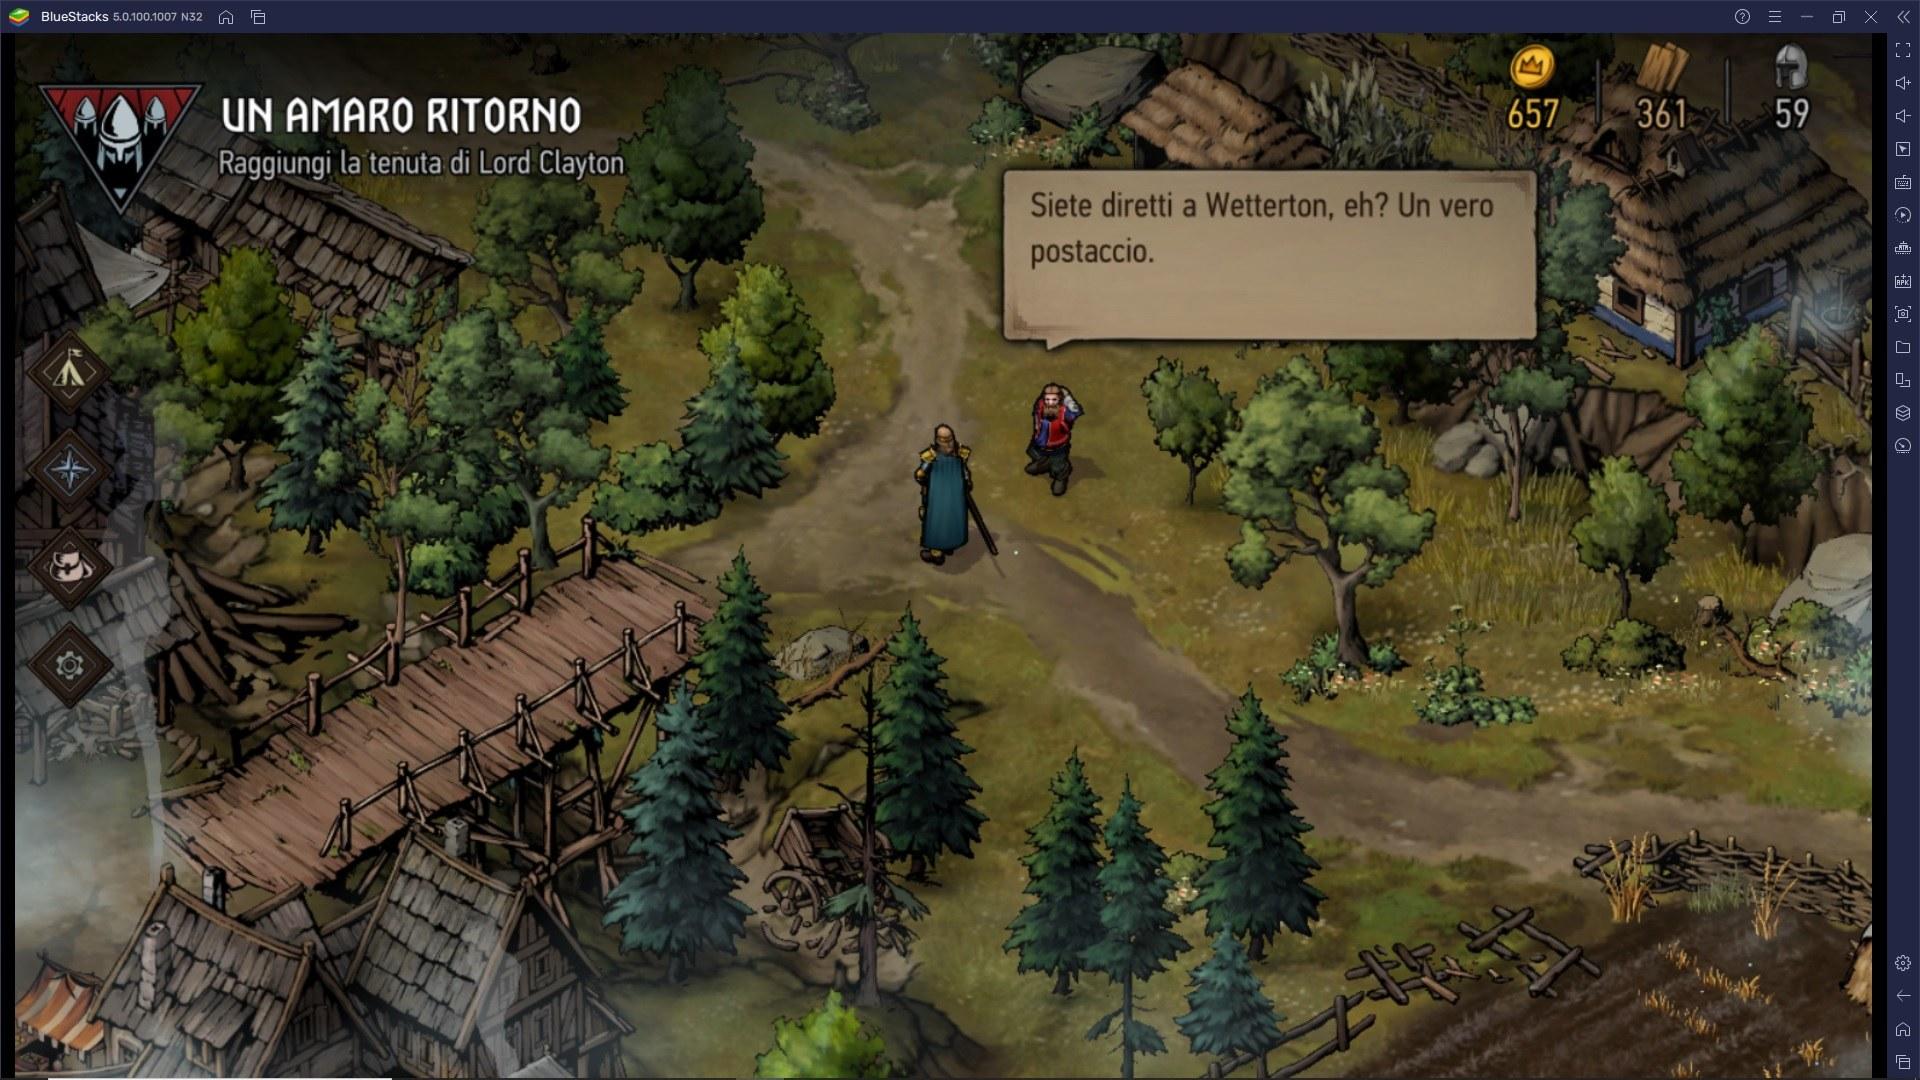 Le Basi di The Witcher Tales: Thronebreaker